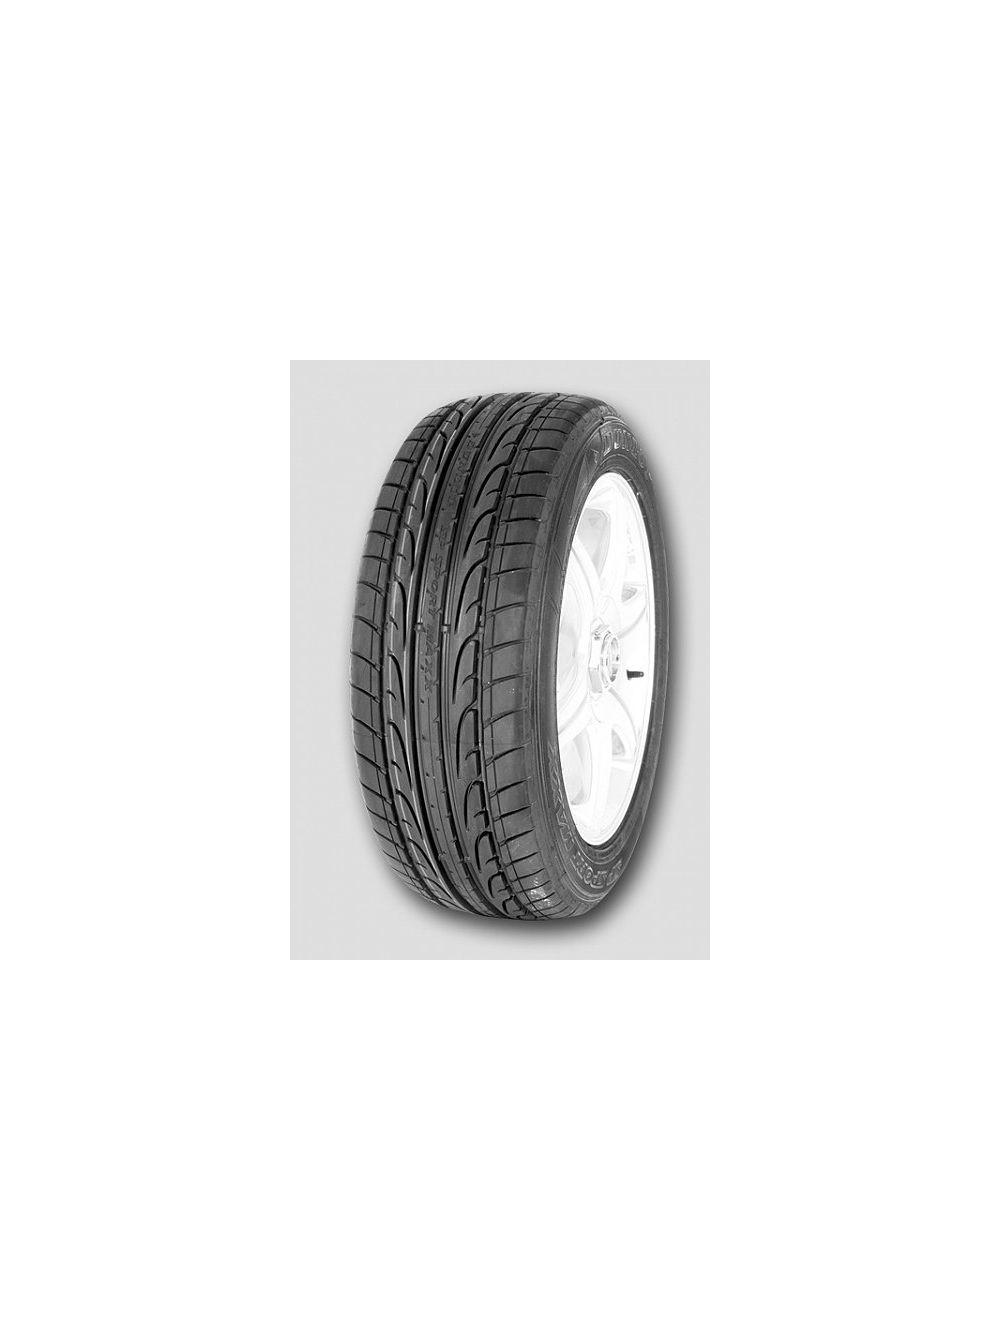 Dunlop 285/35R21 Y SP Sport MAXX XL ROF* DOT18 Nyári gumi